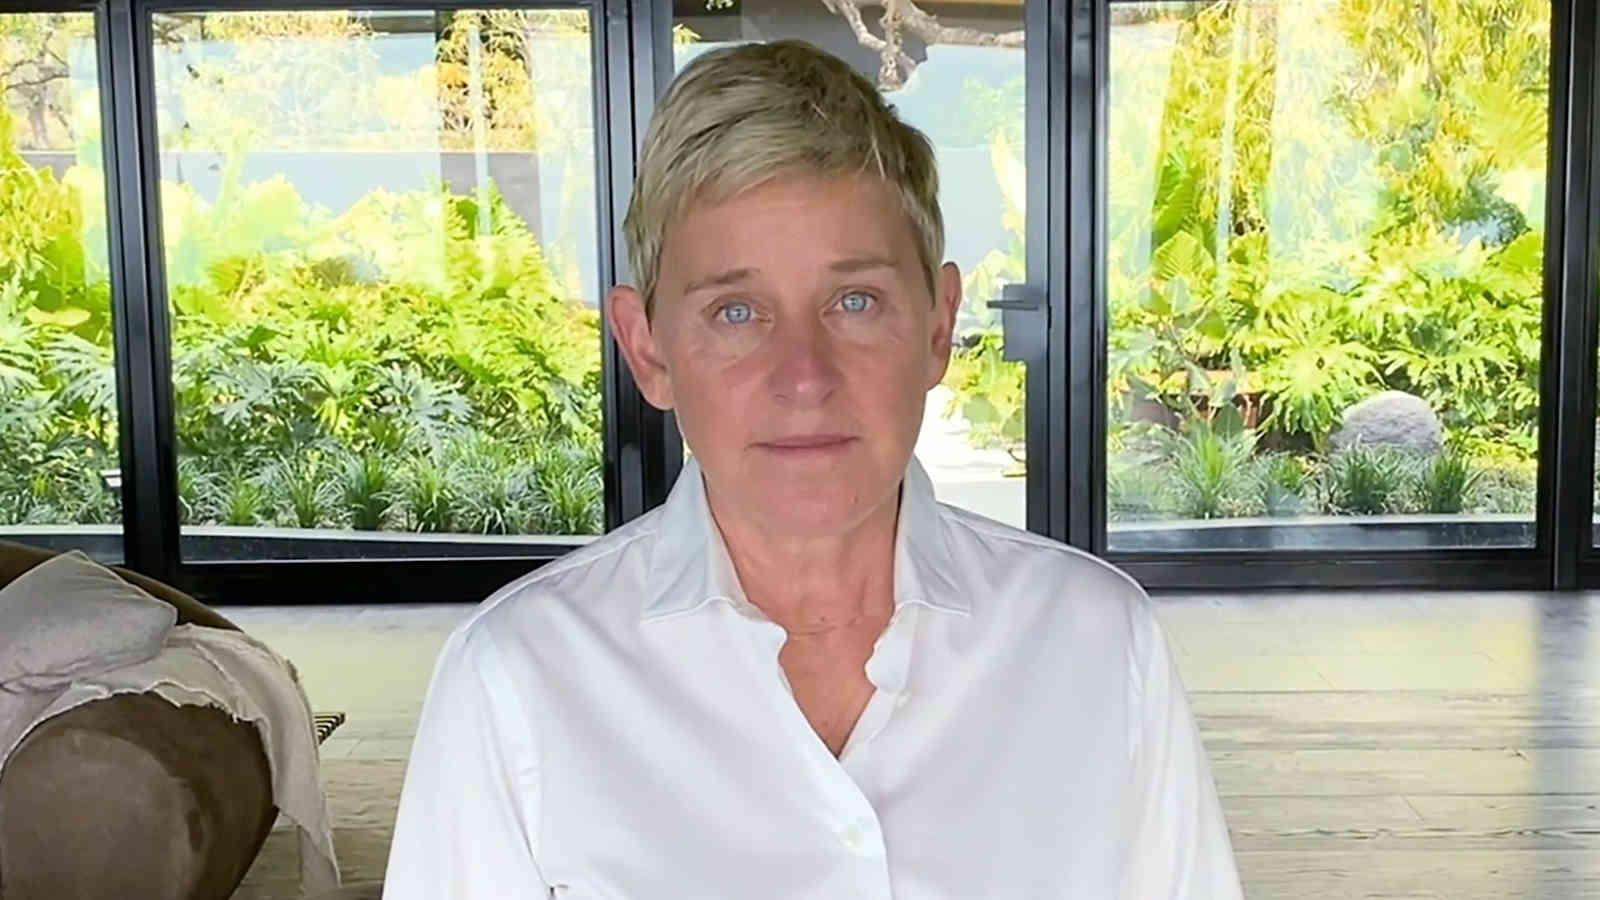 Burglary at Ellen DeGeneres' home was an 'inside job'